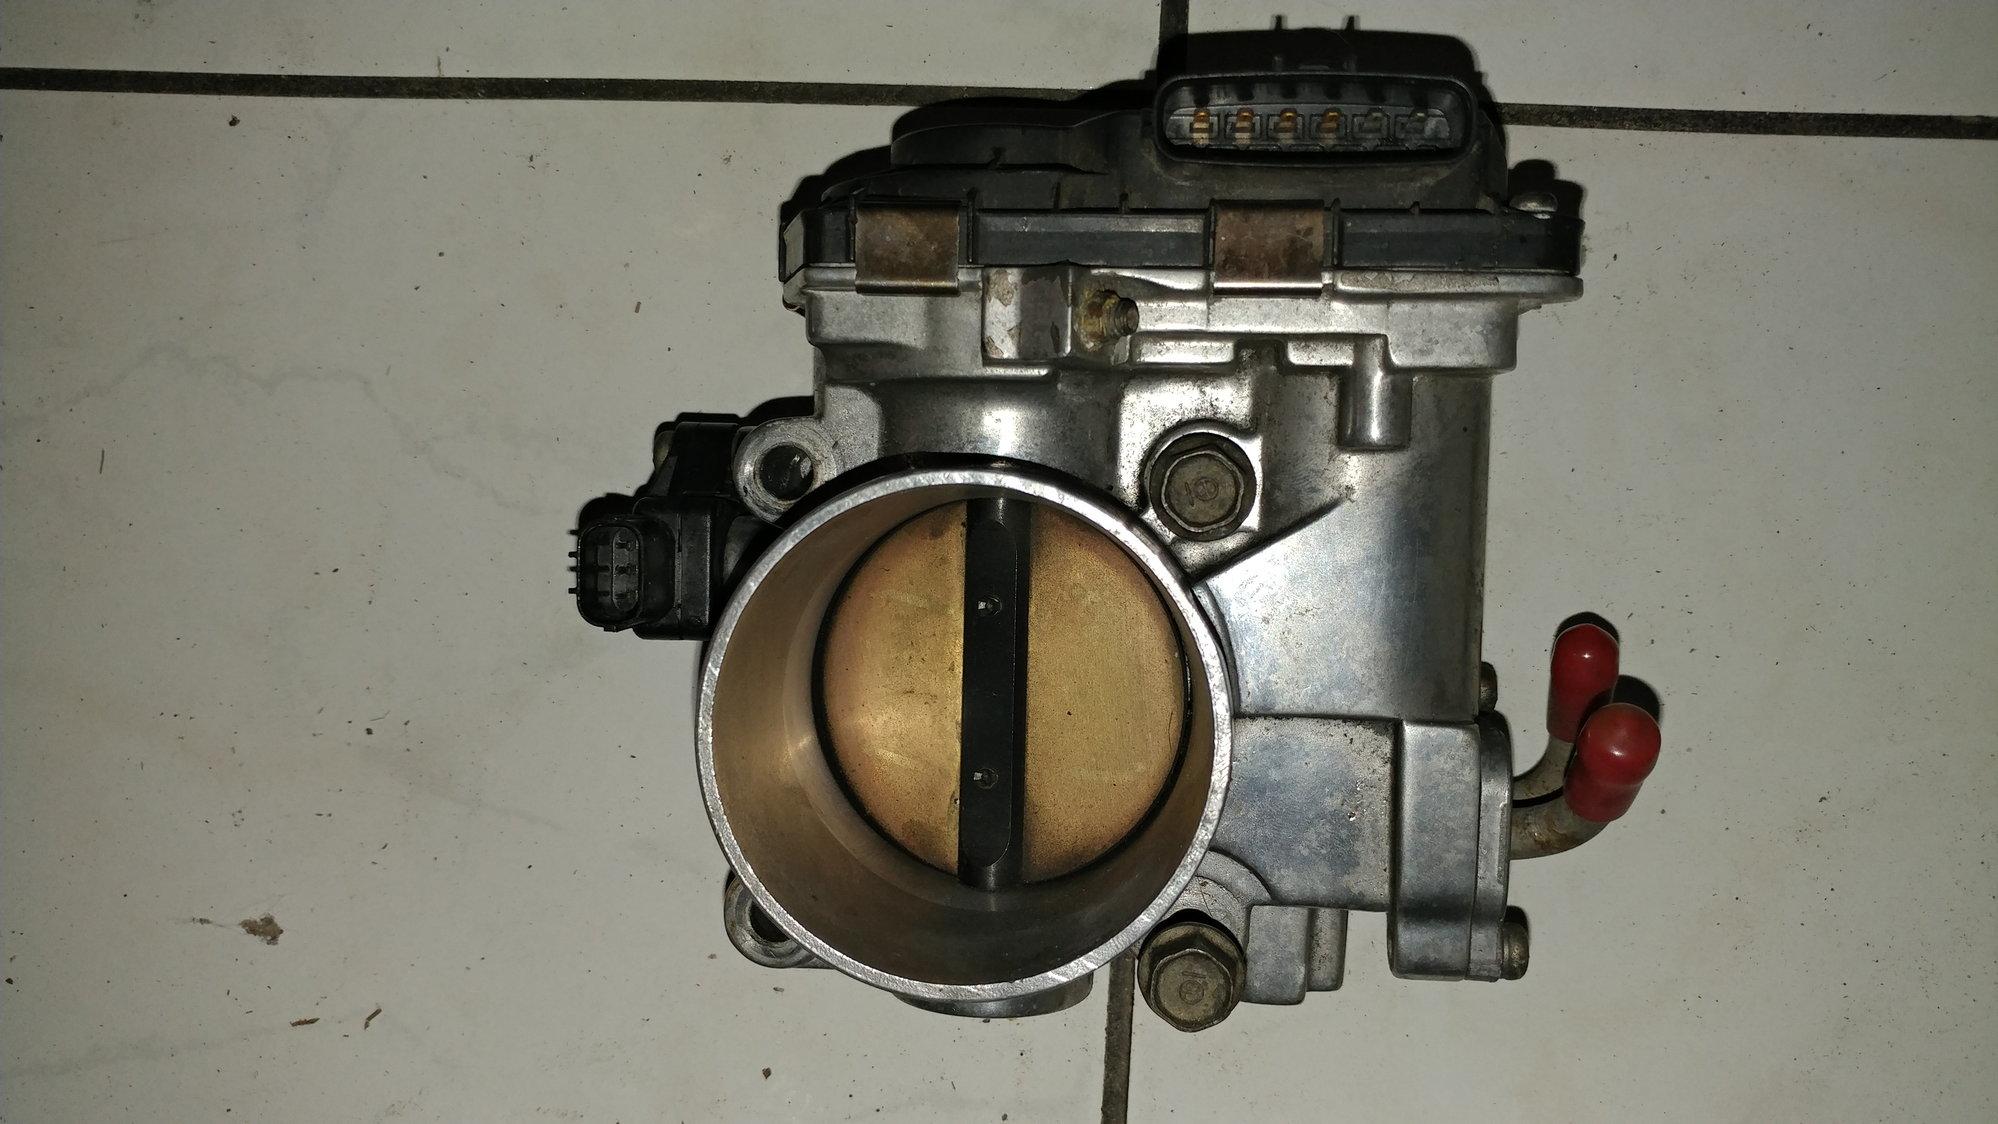 Ported and Polish J32 Intake Manifold w/Polish Throttle Body